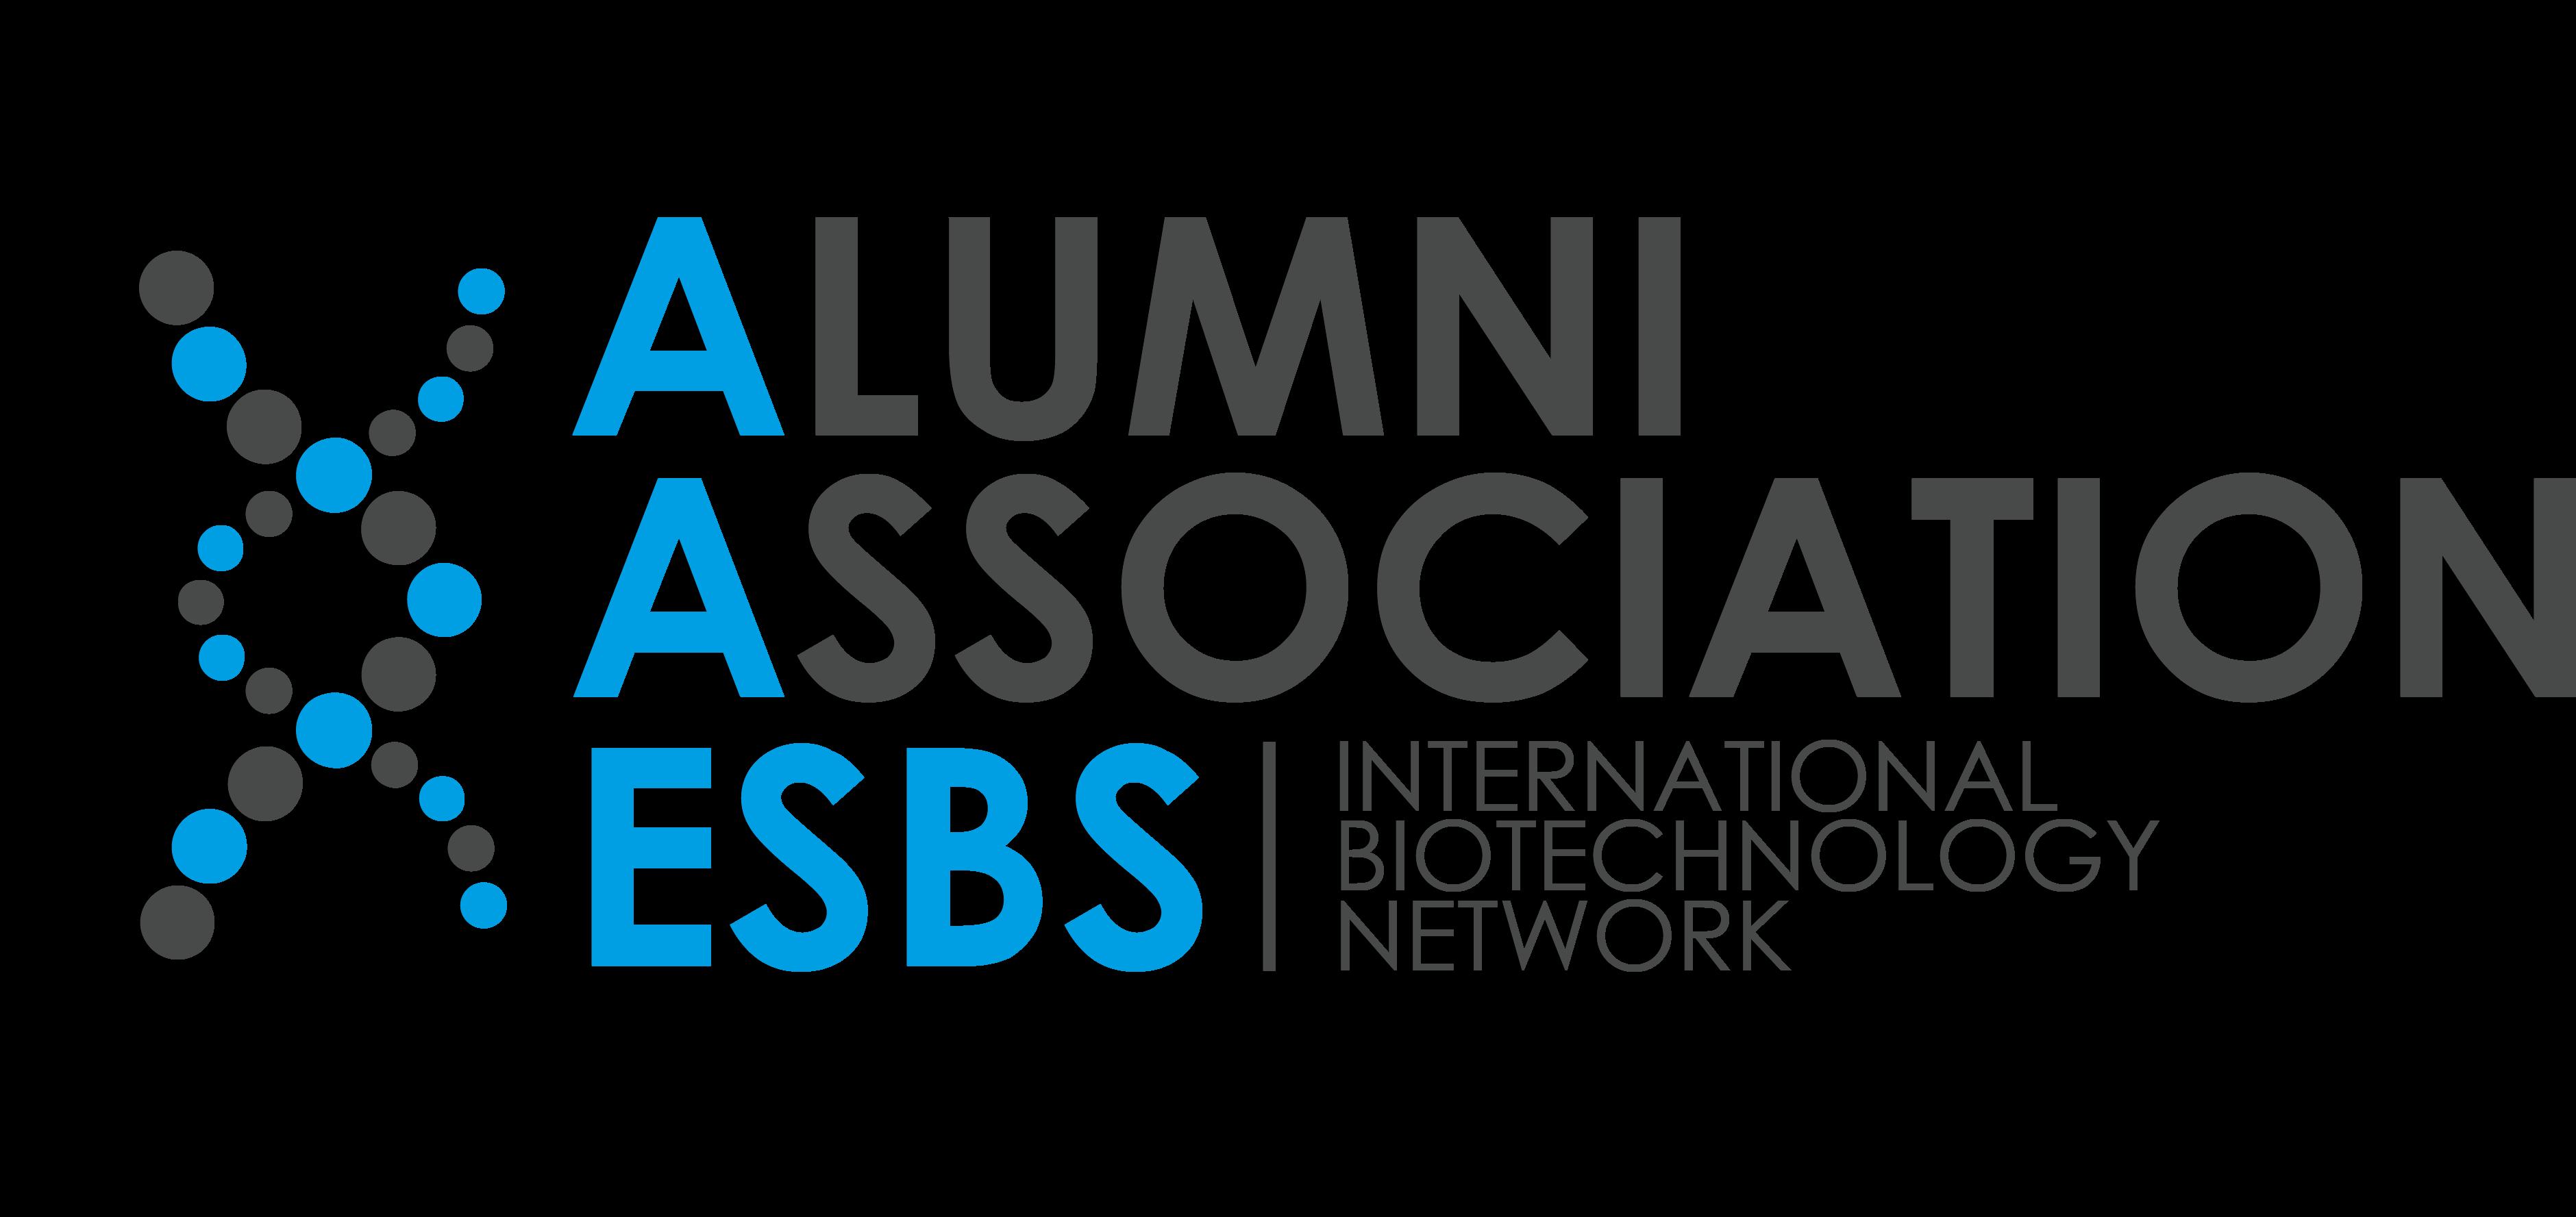 Alumni Association of the ESBS